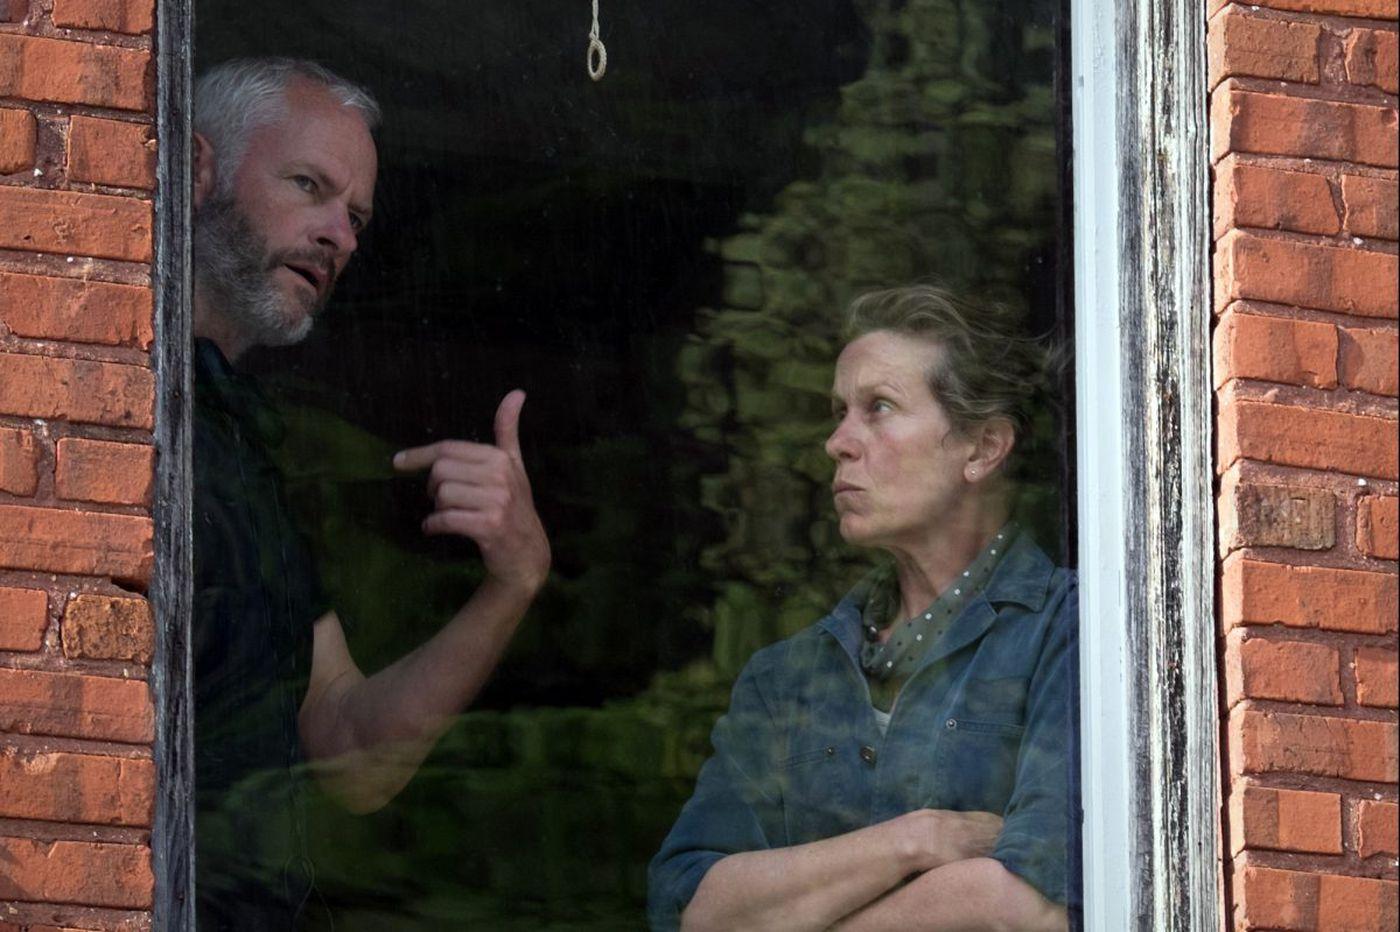 Director Martin McDonagh talks about his Oscar-buzz movie 'Three Billboards Outside Ebbing, Missouri'